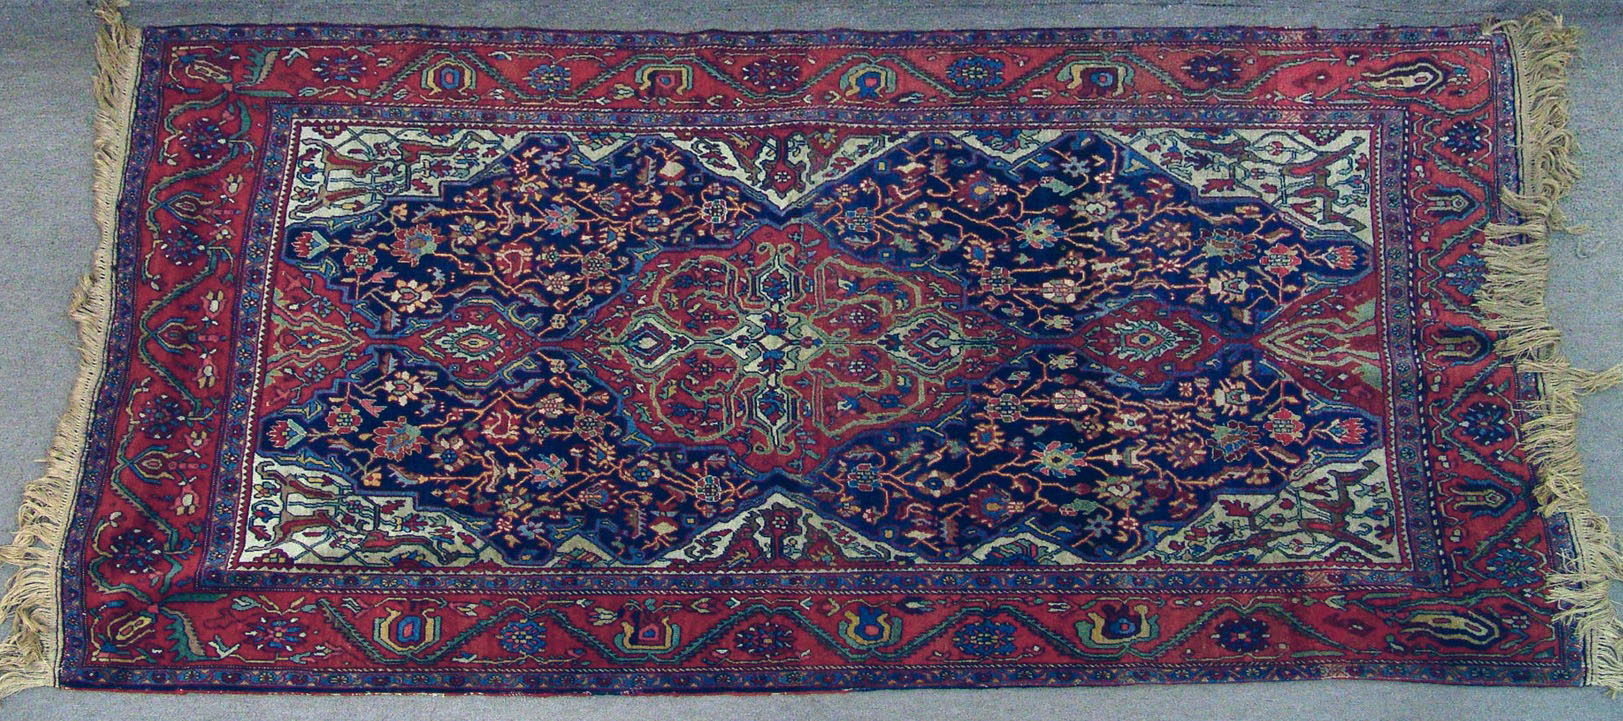 Bgw remate 230 alfombra gek htm gendata for Alfombra persa azul